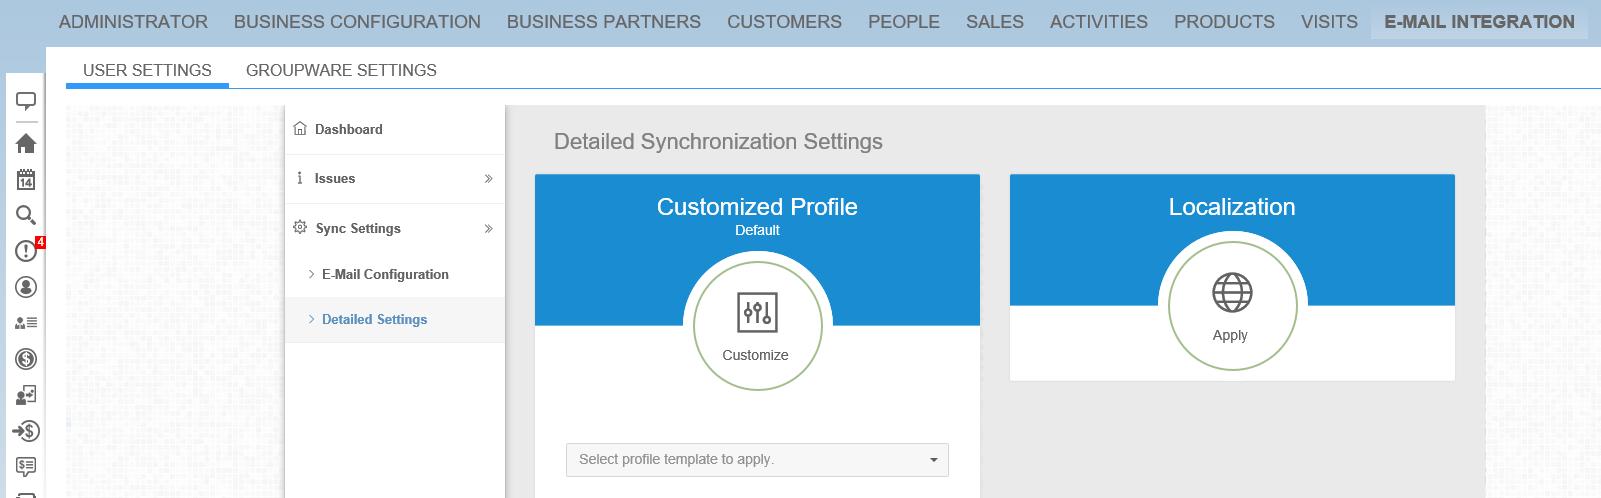 C4C Server side Integration with Microsoft Outlook   SAP Blogs